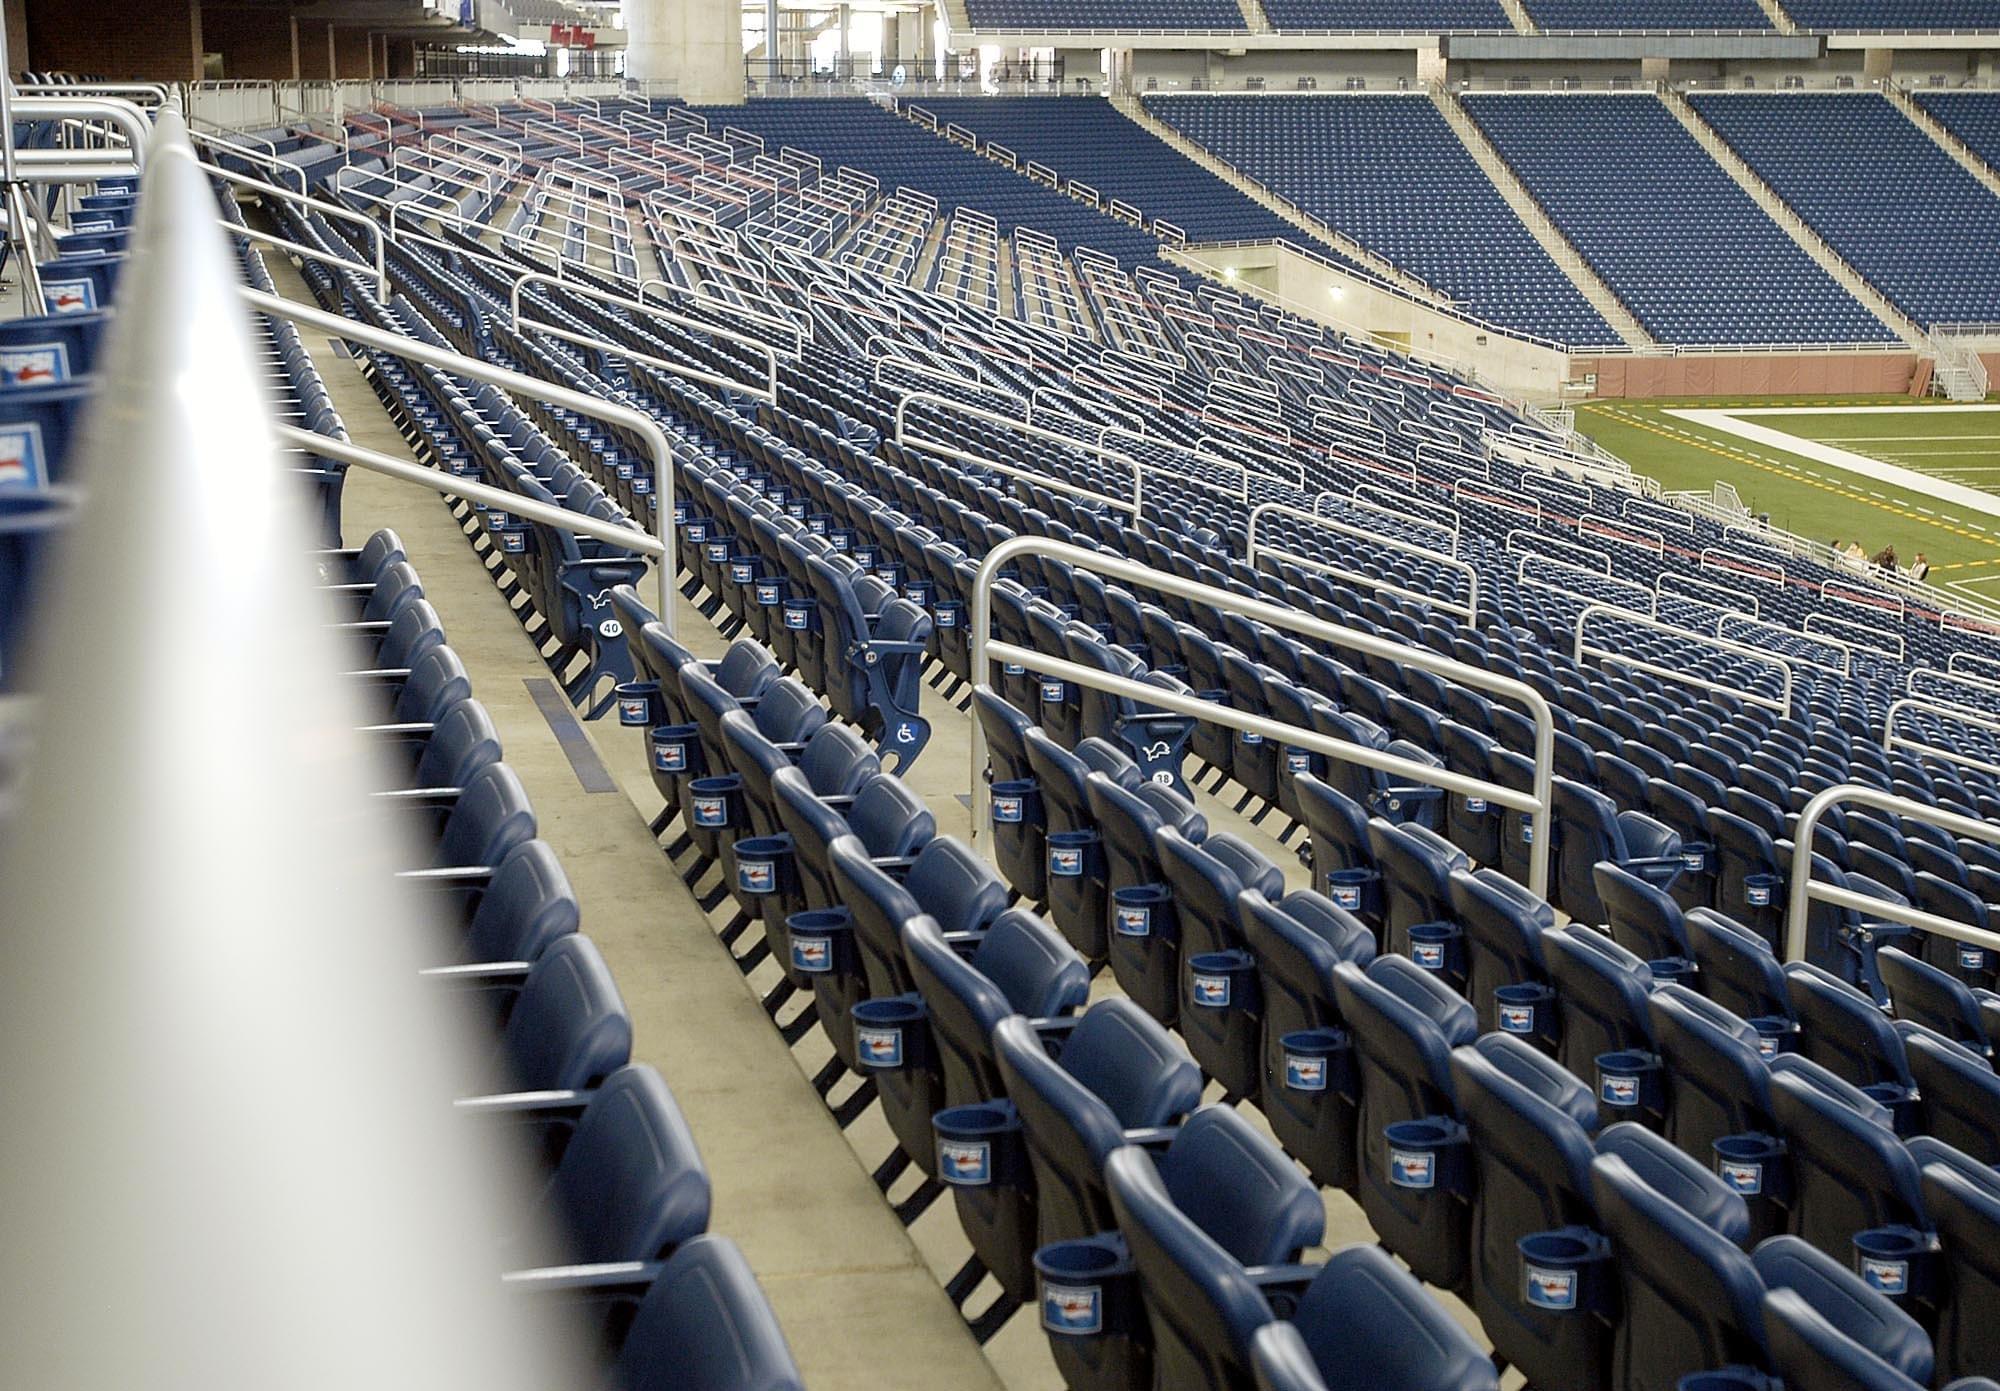 Ideal Shield aluminum handrail at Ford Field in Detroit, Michigan